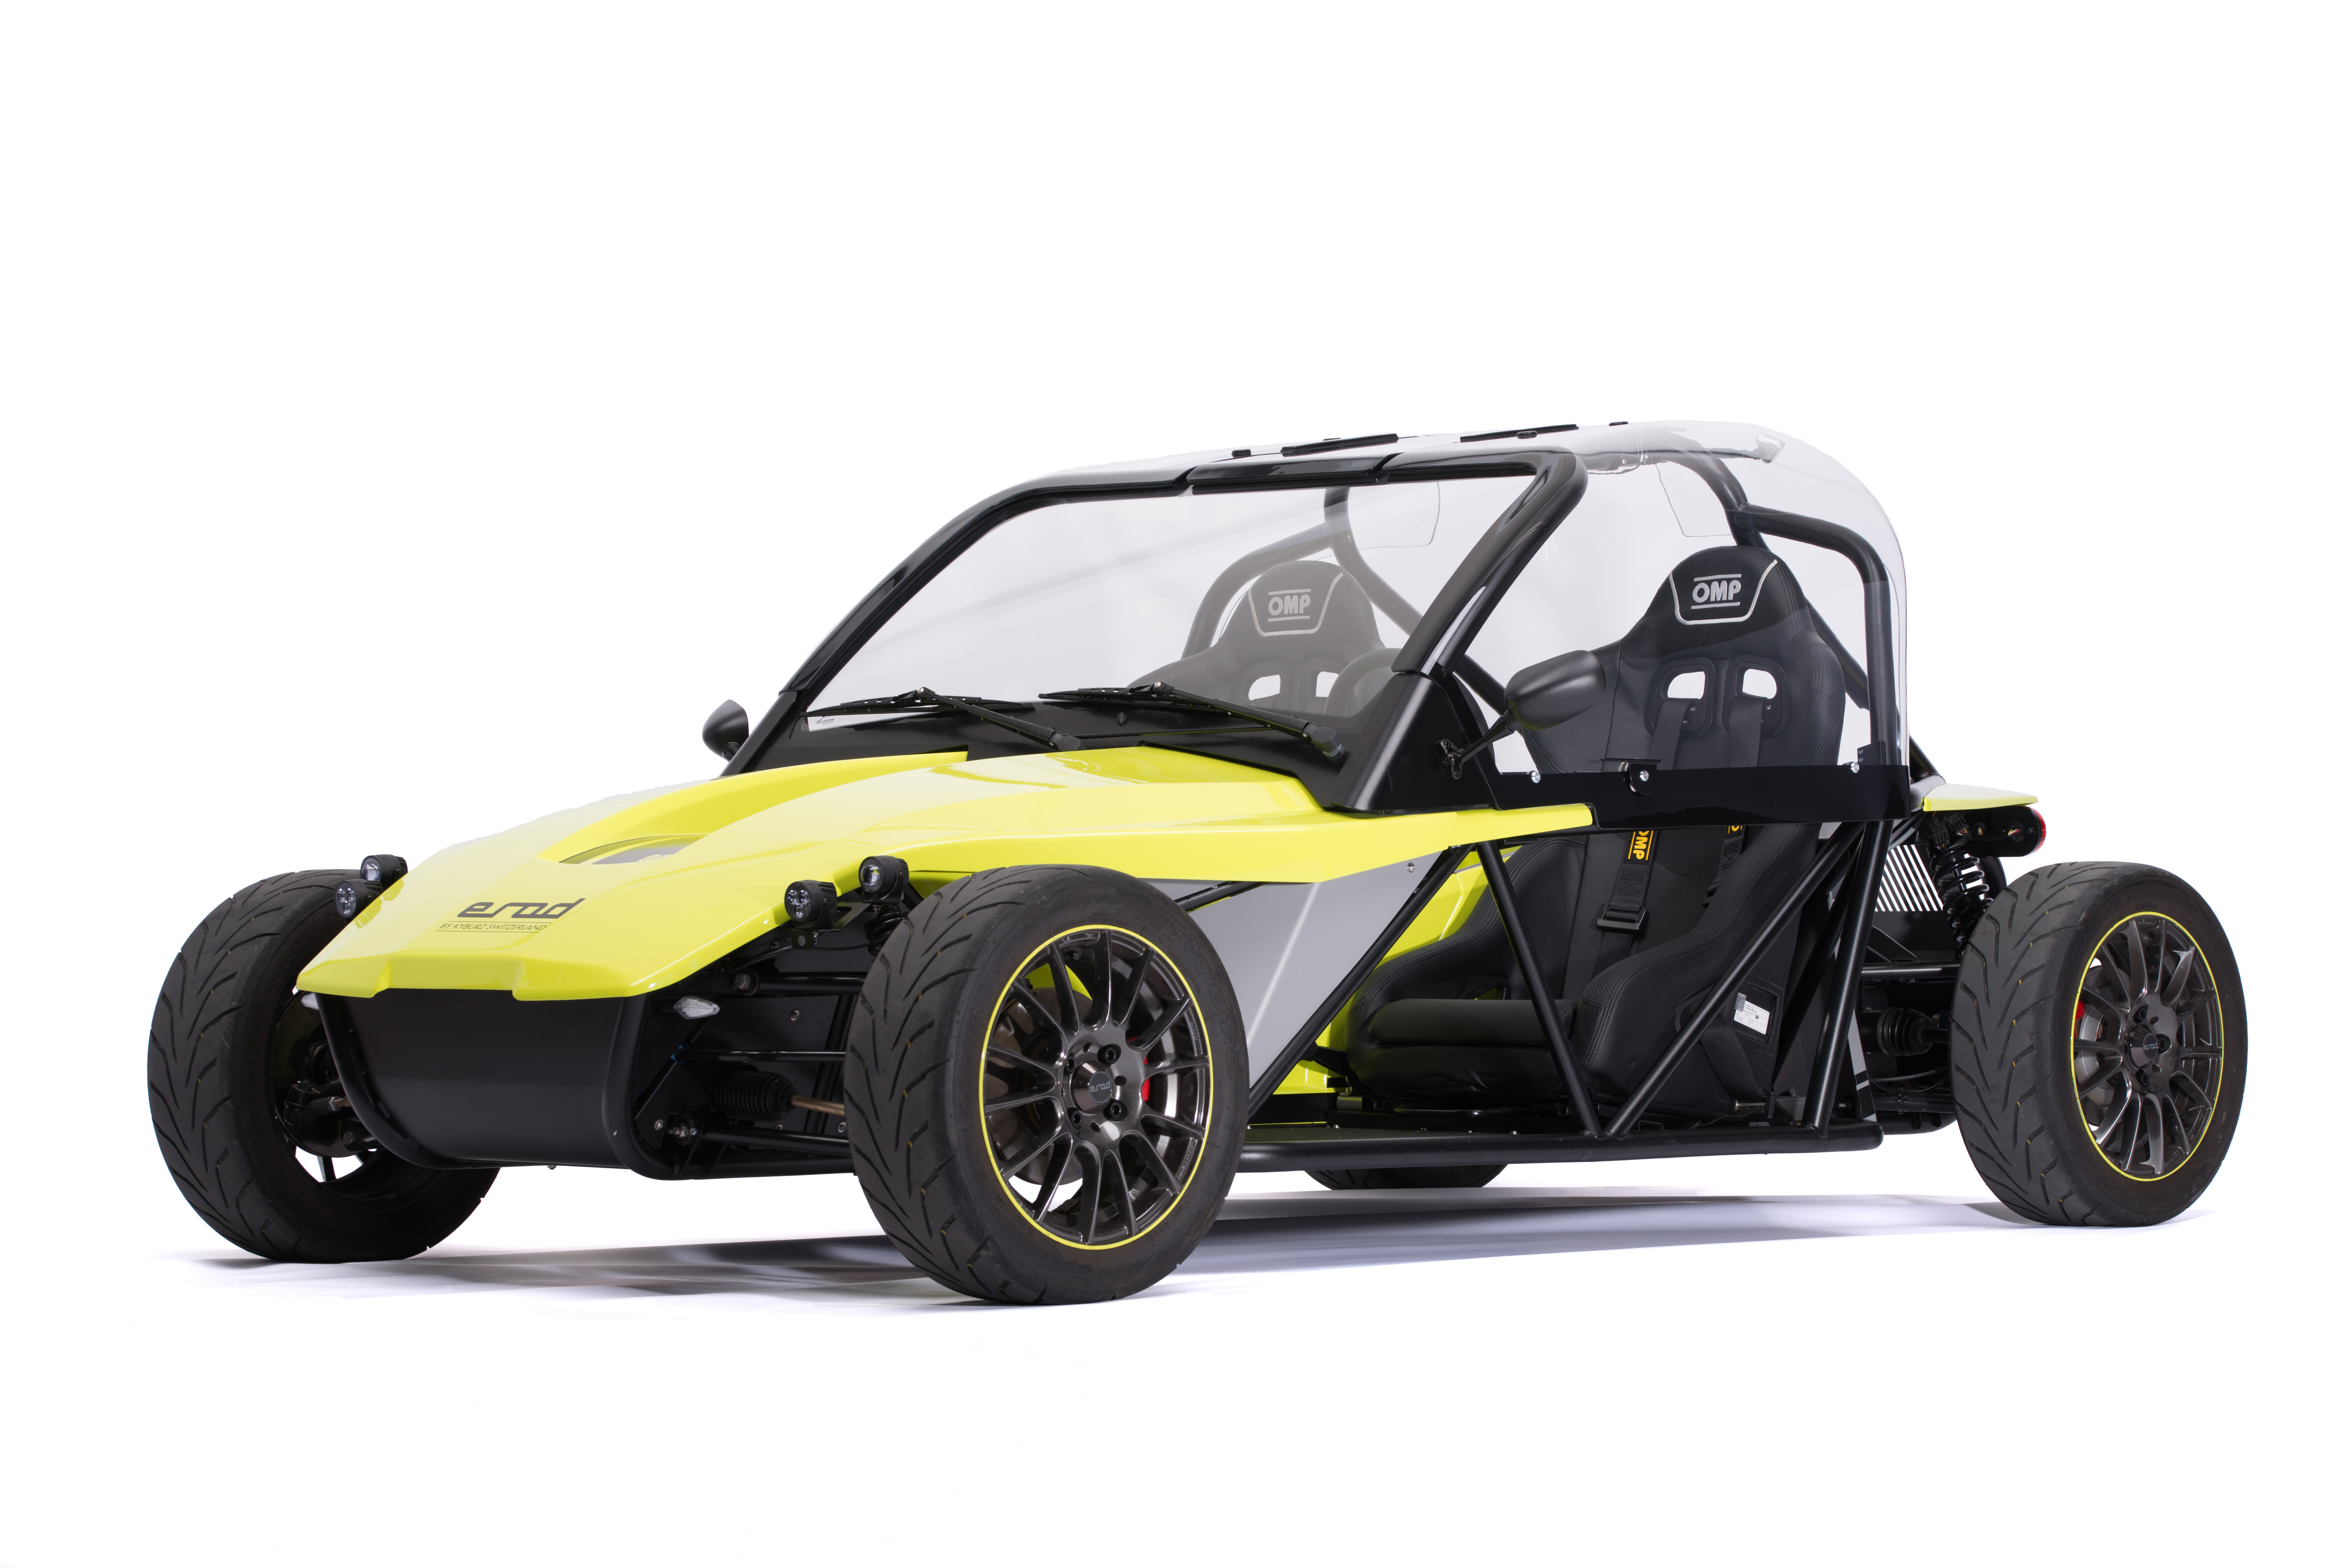 Elektro Roadster Kyburz eRod